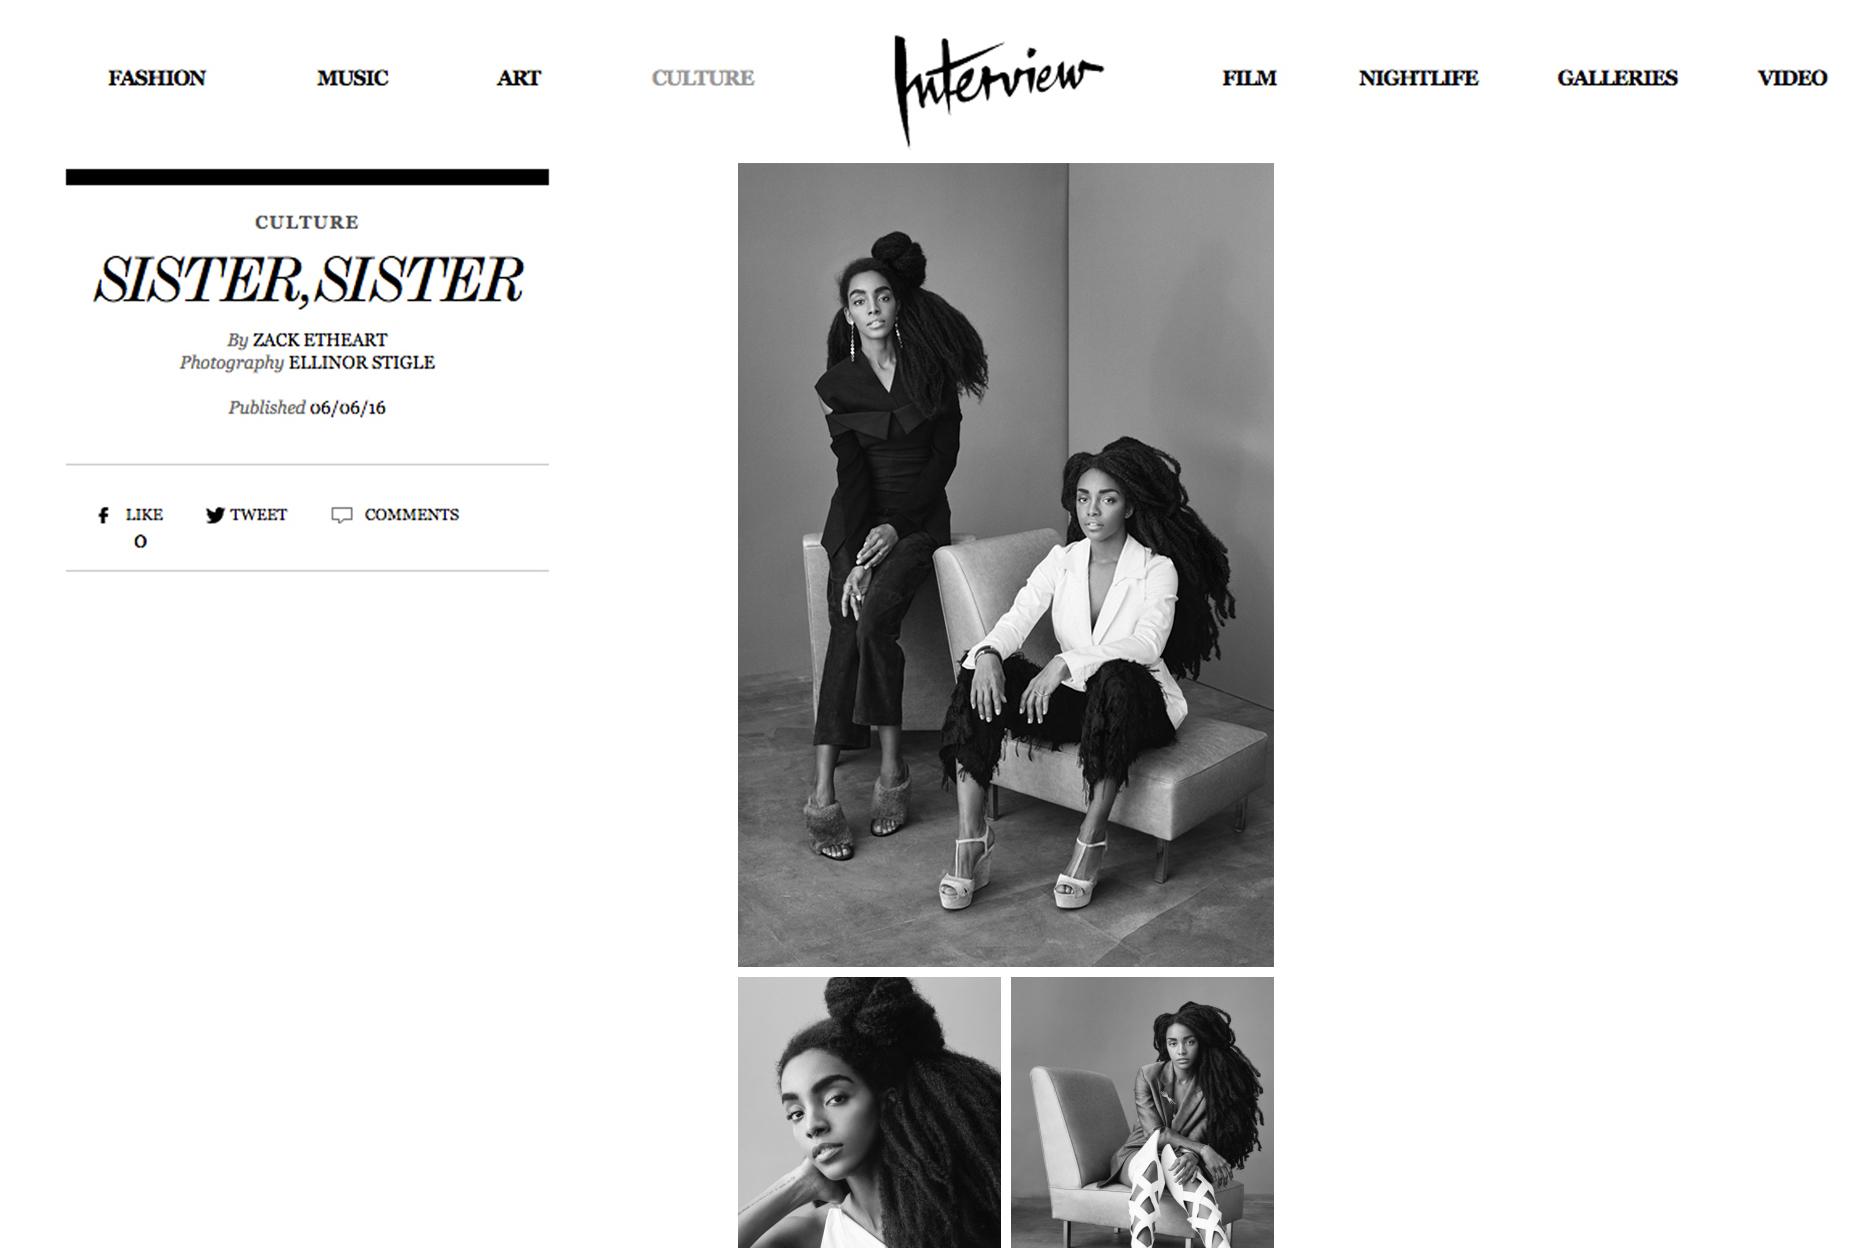 interview-magazine-tk-wonder-cipriana-quann-urban-bush-babes-ellinor-stigle